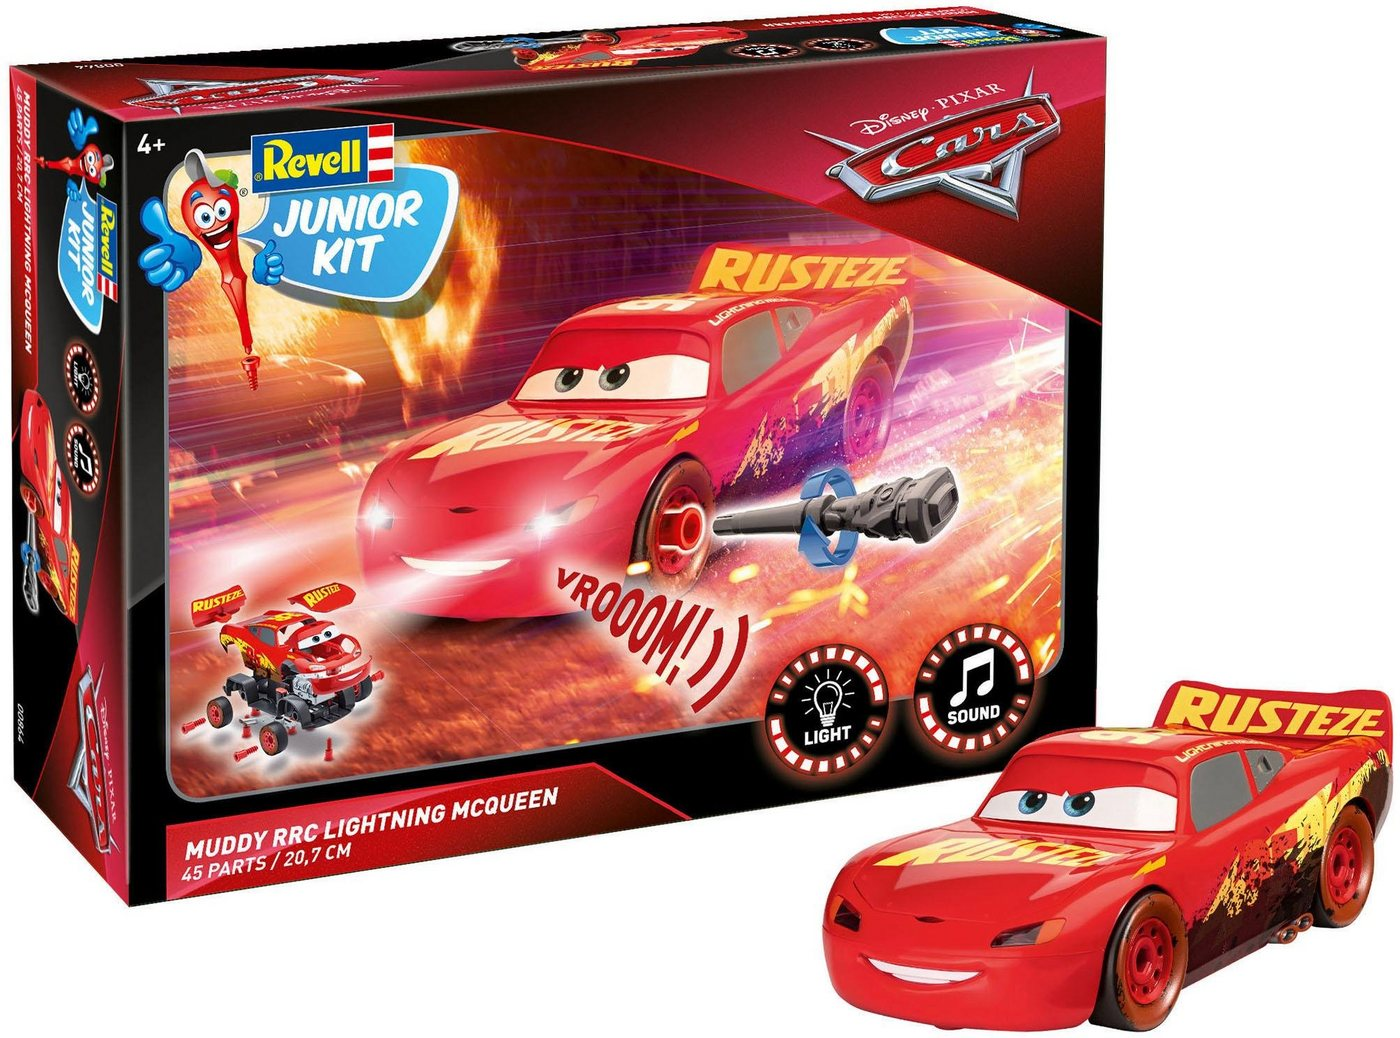 Revell Modellbausatz Auto Licht/Sound, »Junior Kit Disney Pixar Cars, Muddy RRC Lightning McQueen «